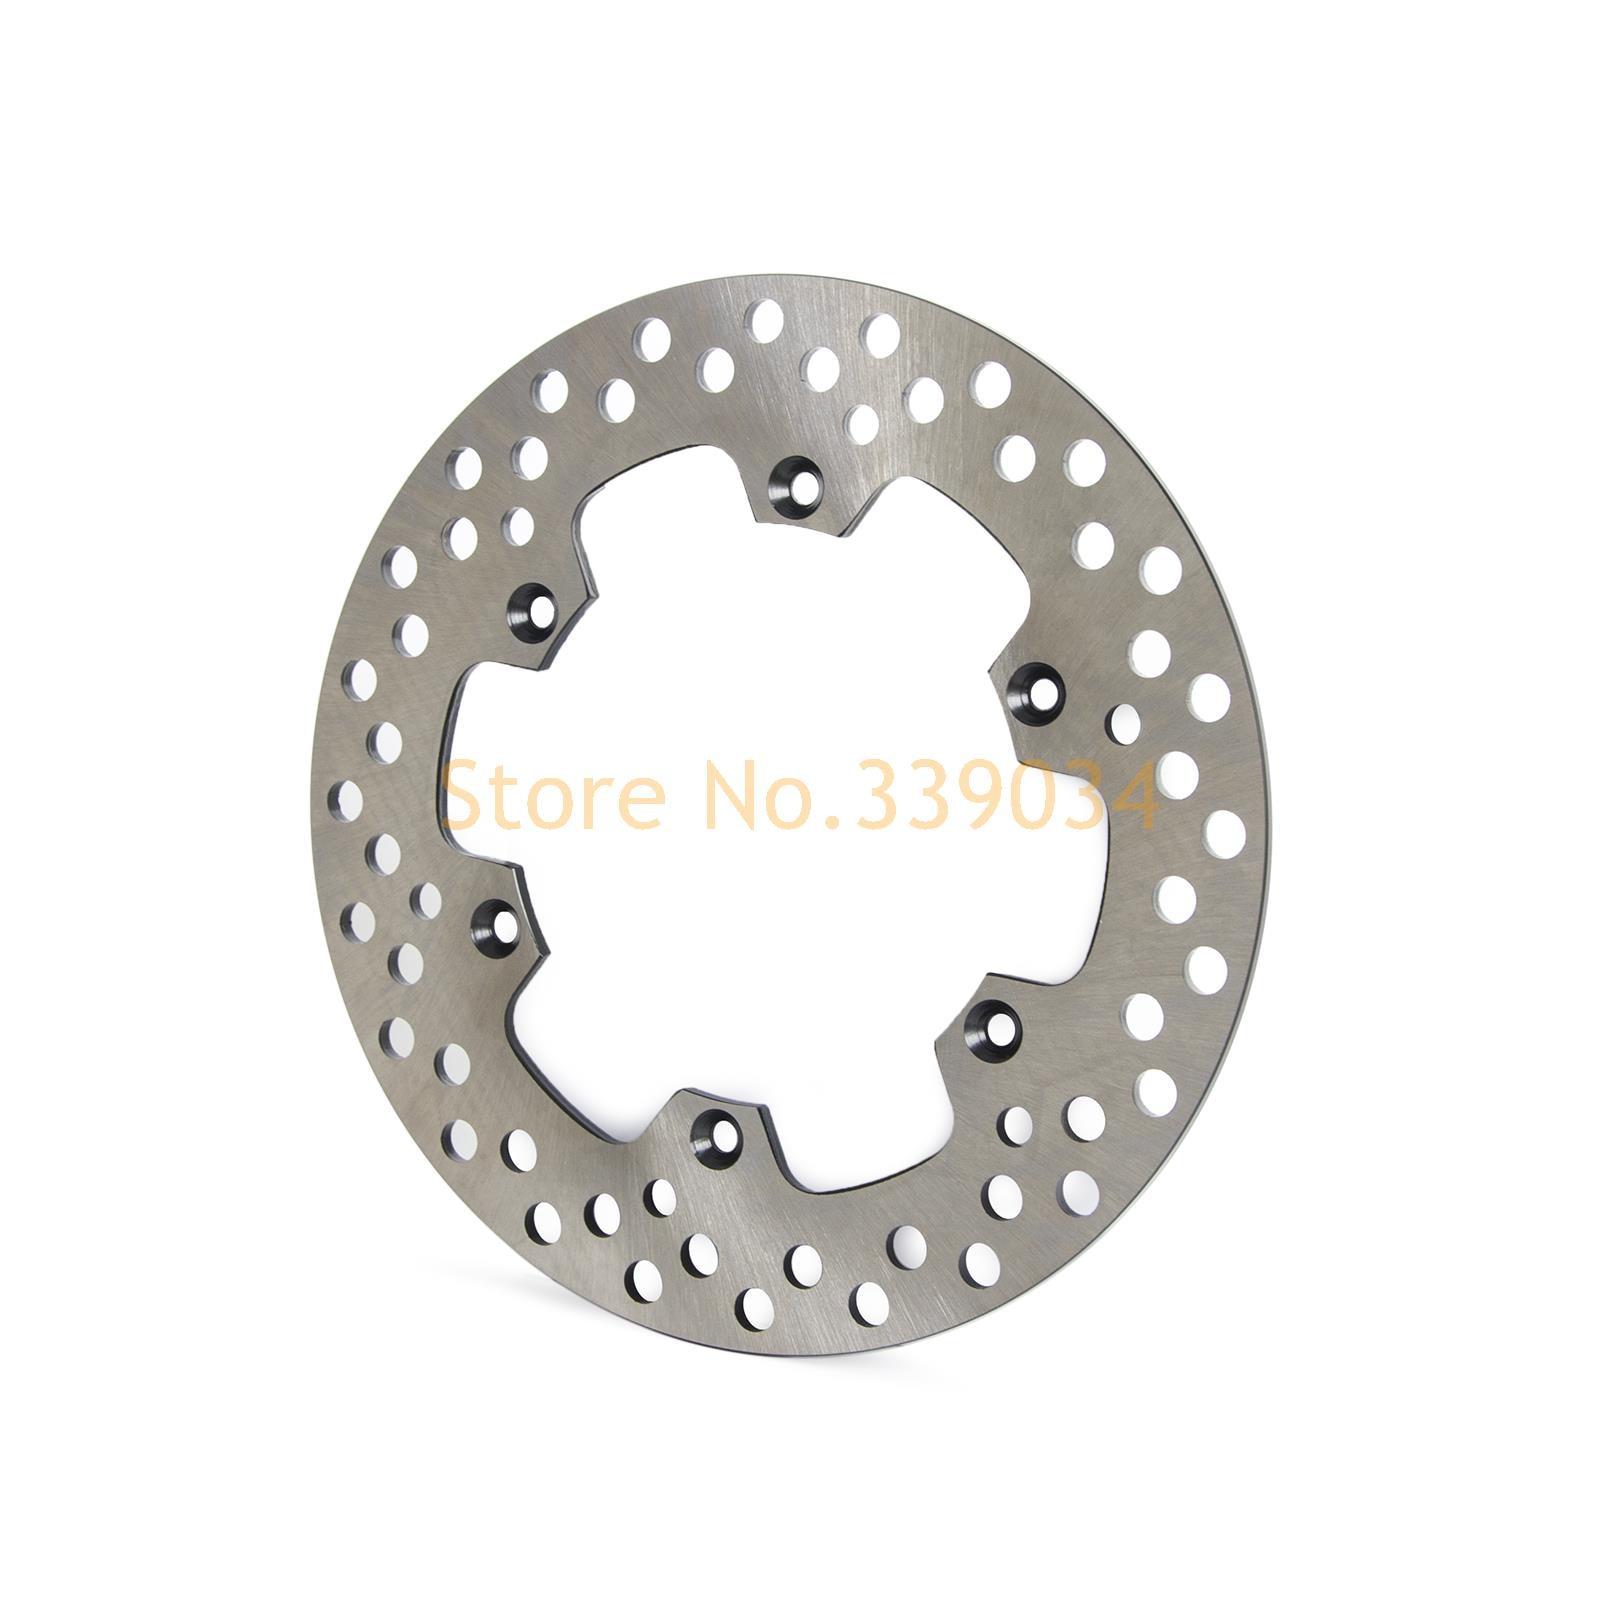 ФОТО Motorcycle Steel Rear Brake Disc For Suzuki DR 125 SMK8/SMK9/SML0 08-12